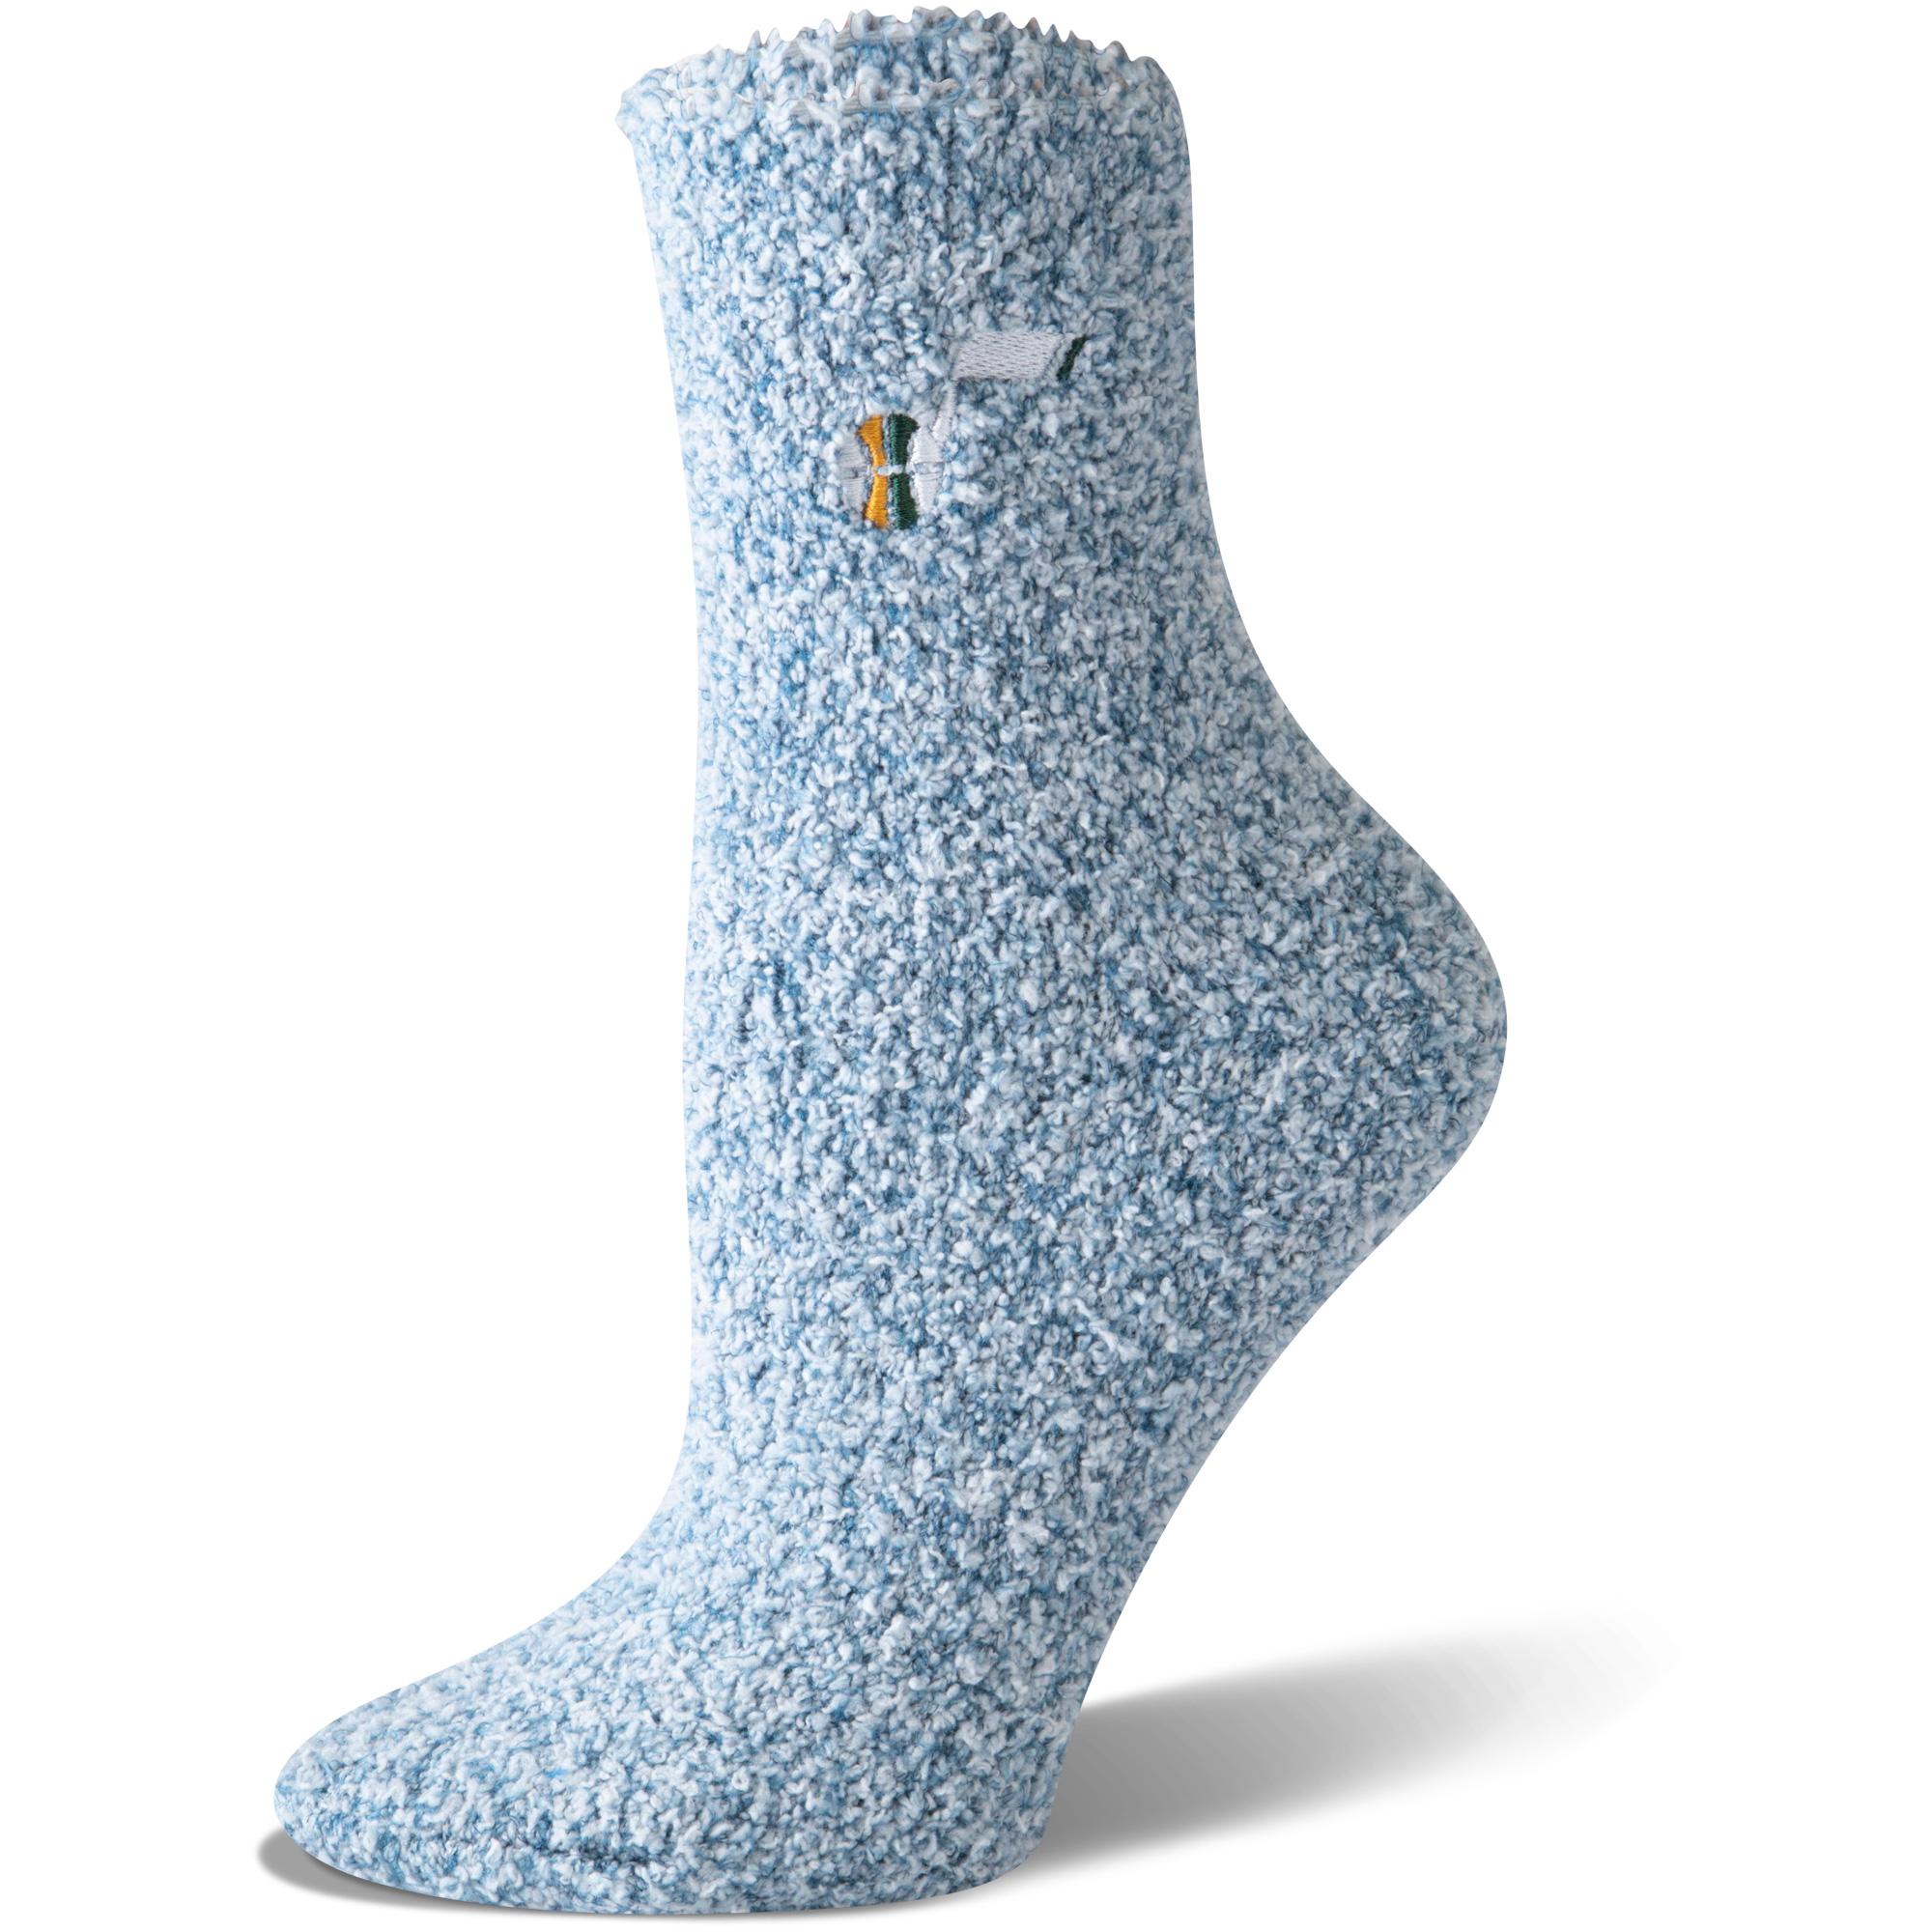 Utah Jazz Women's Fuzzy Block Tri-Blend Socks - Navy - M